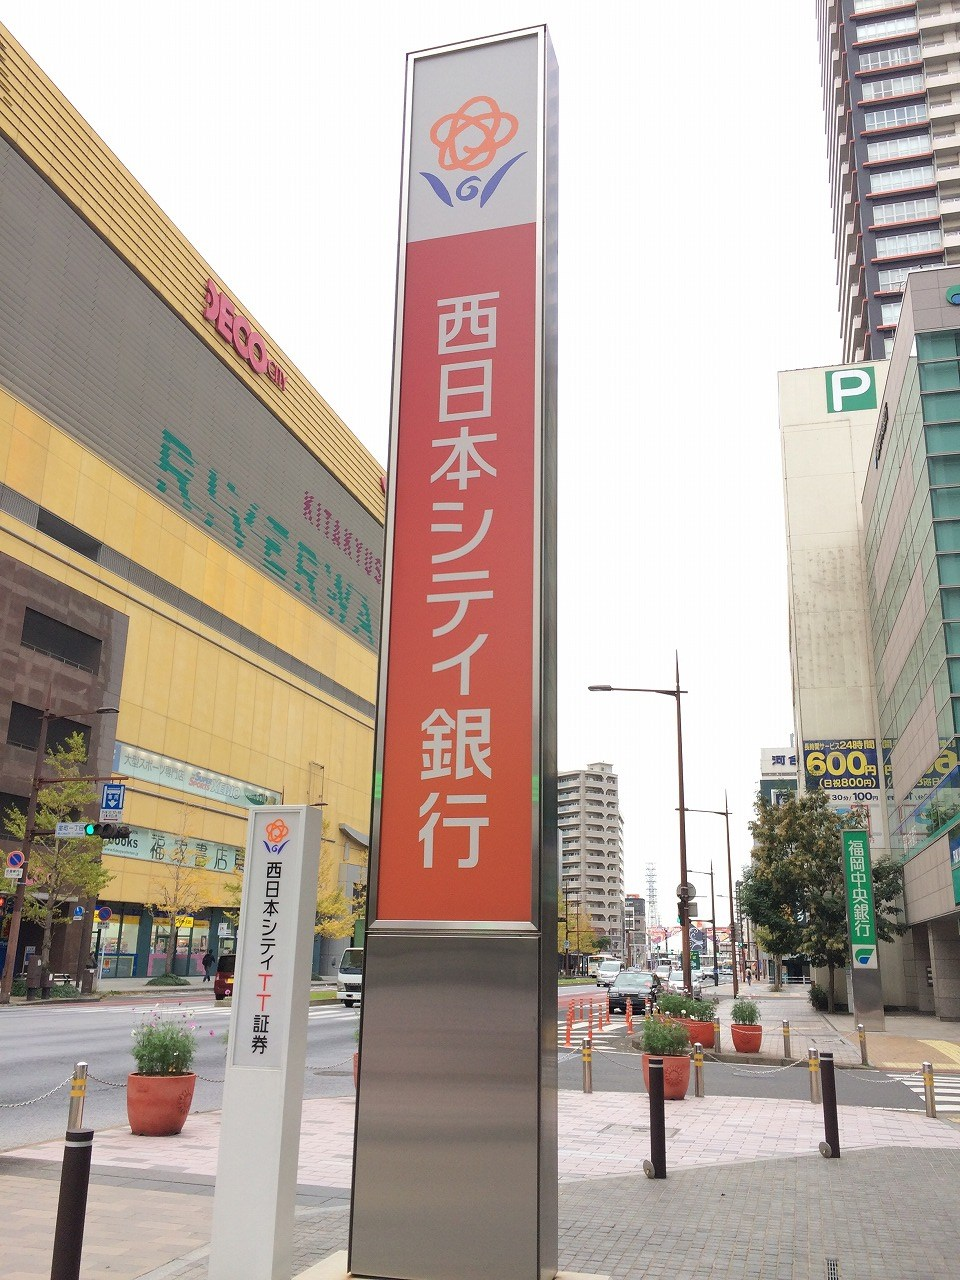 銀行:西日本シティ銀行本城支店 1340m